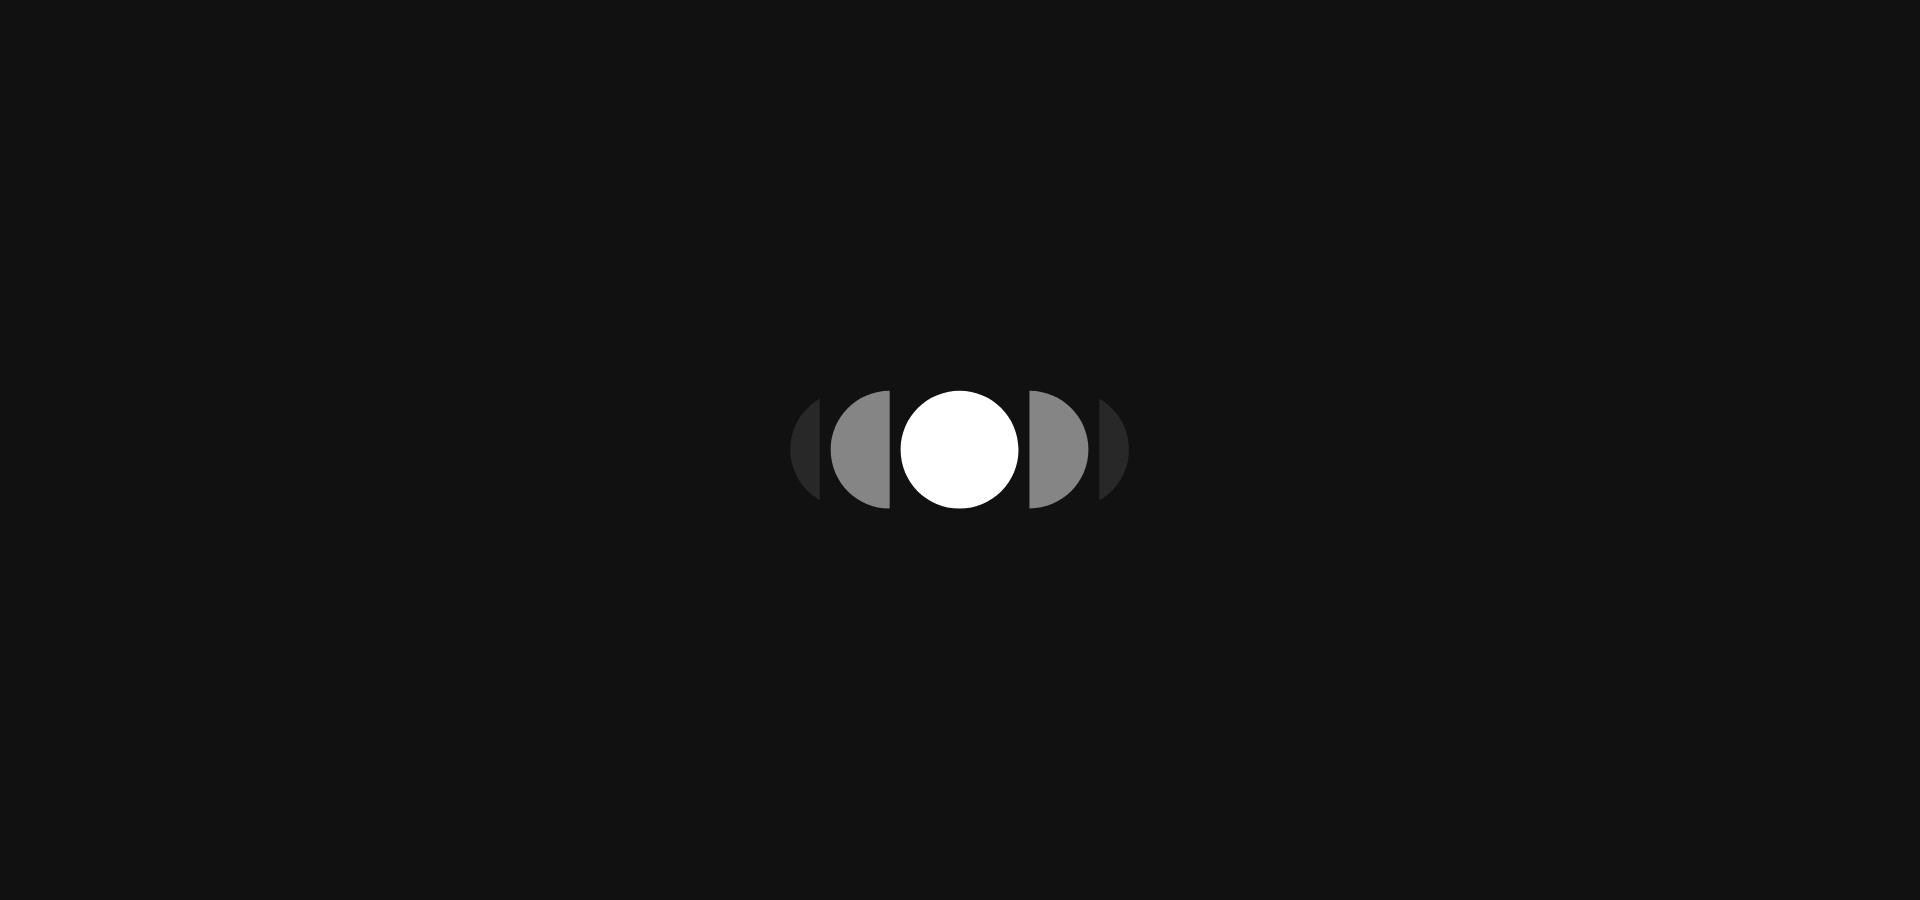 Dominik-Pacholczyk-Logo-Design-Collection-17